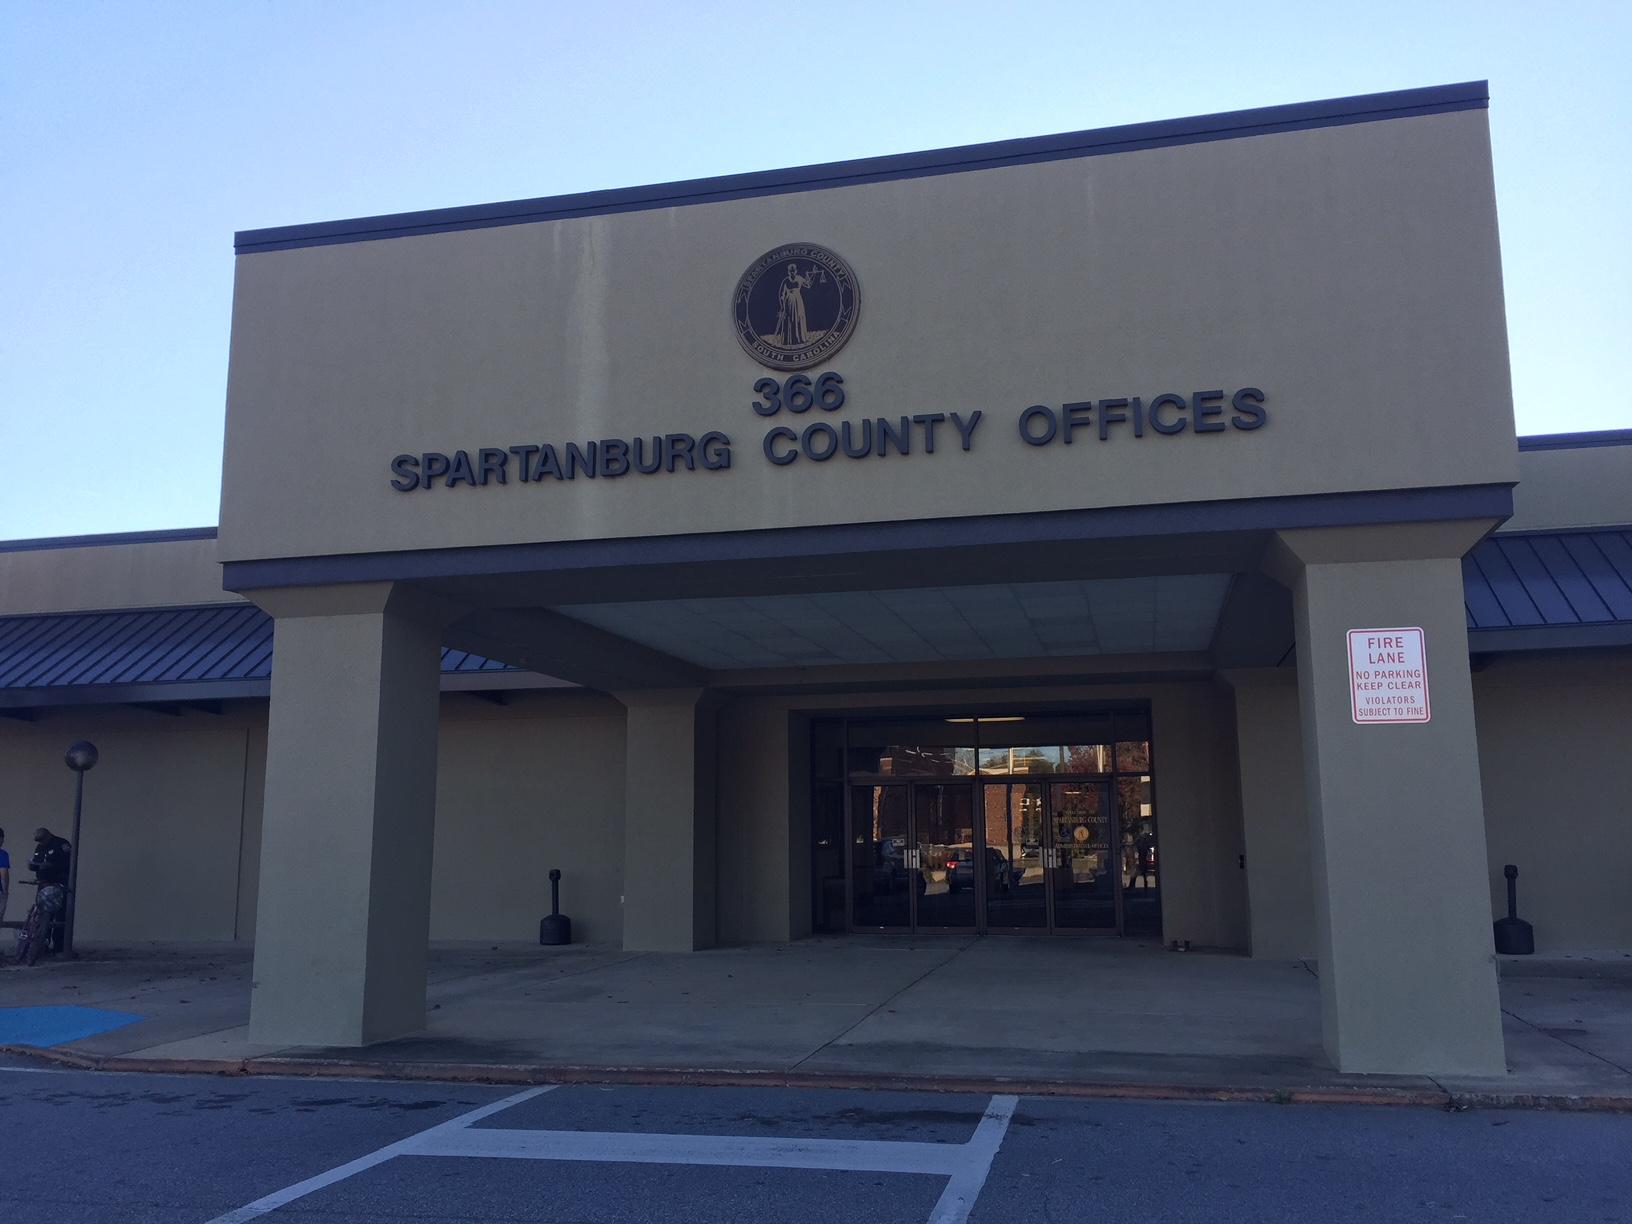 Spartanburg County_492160